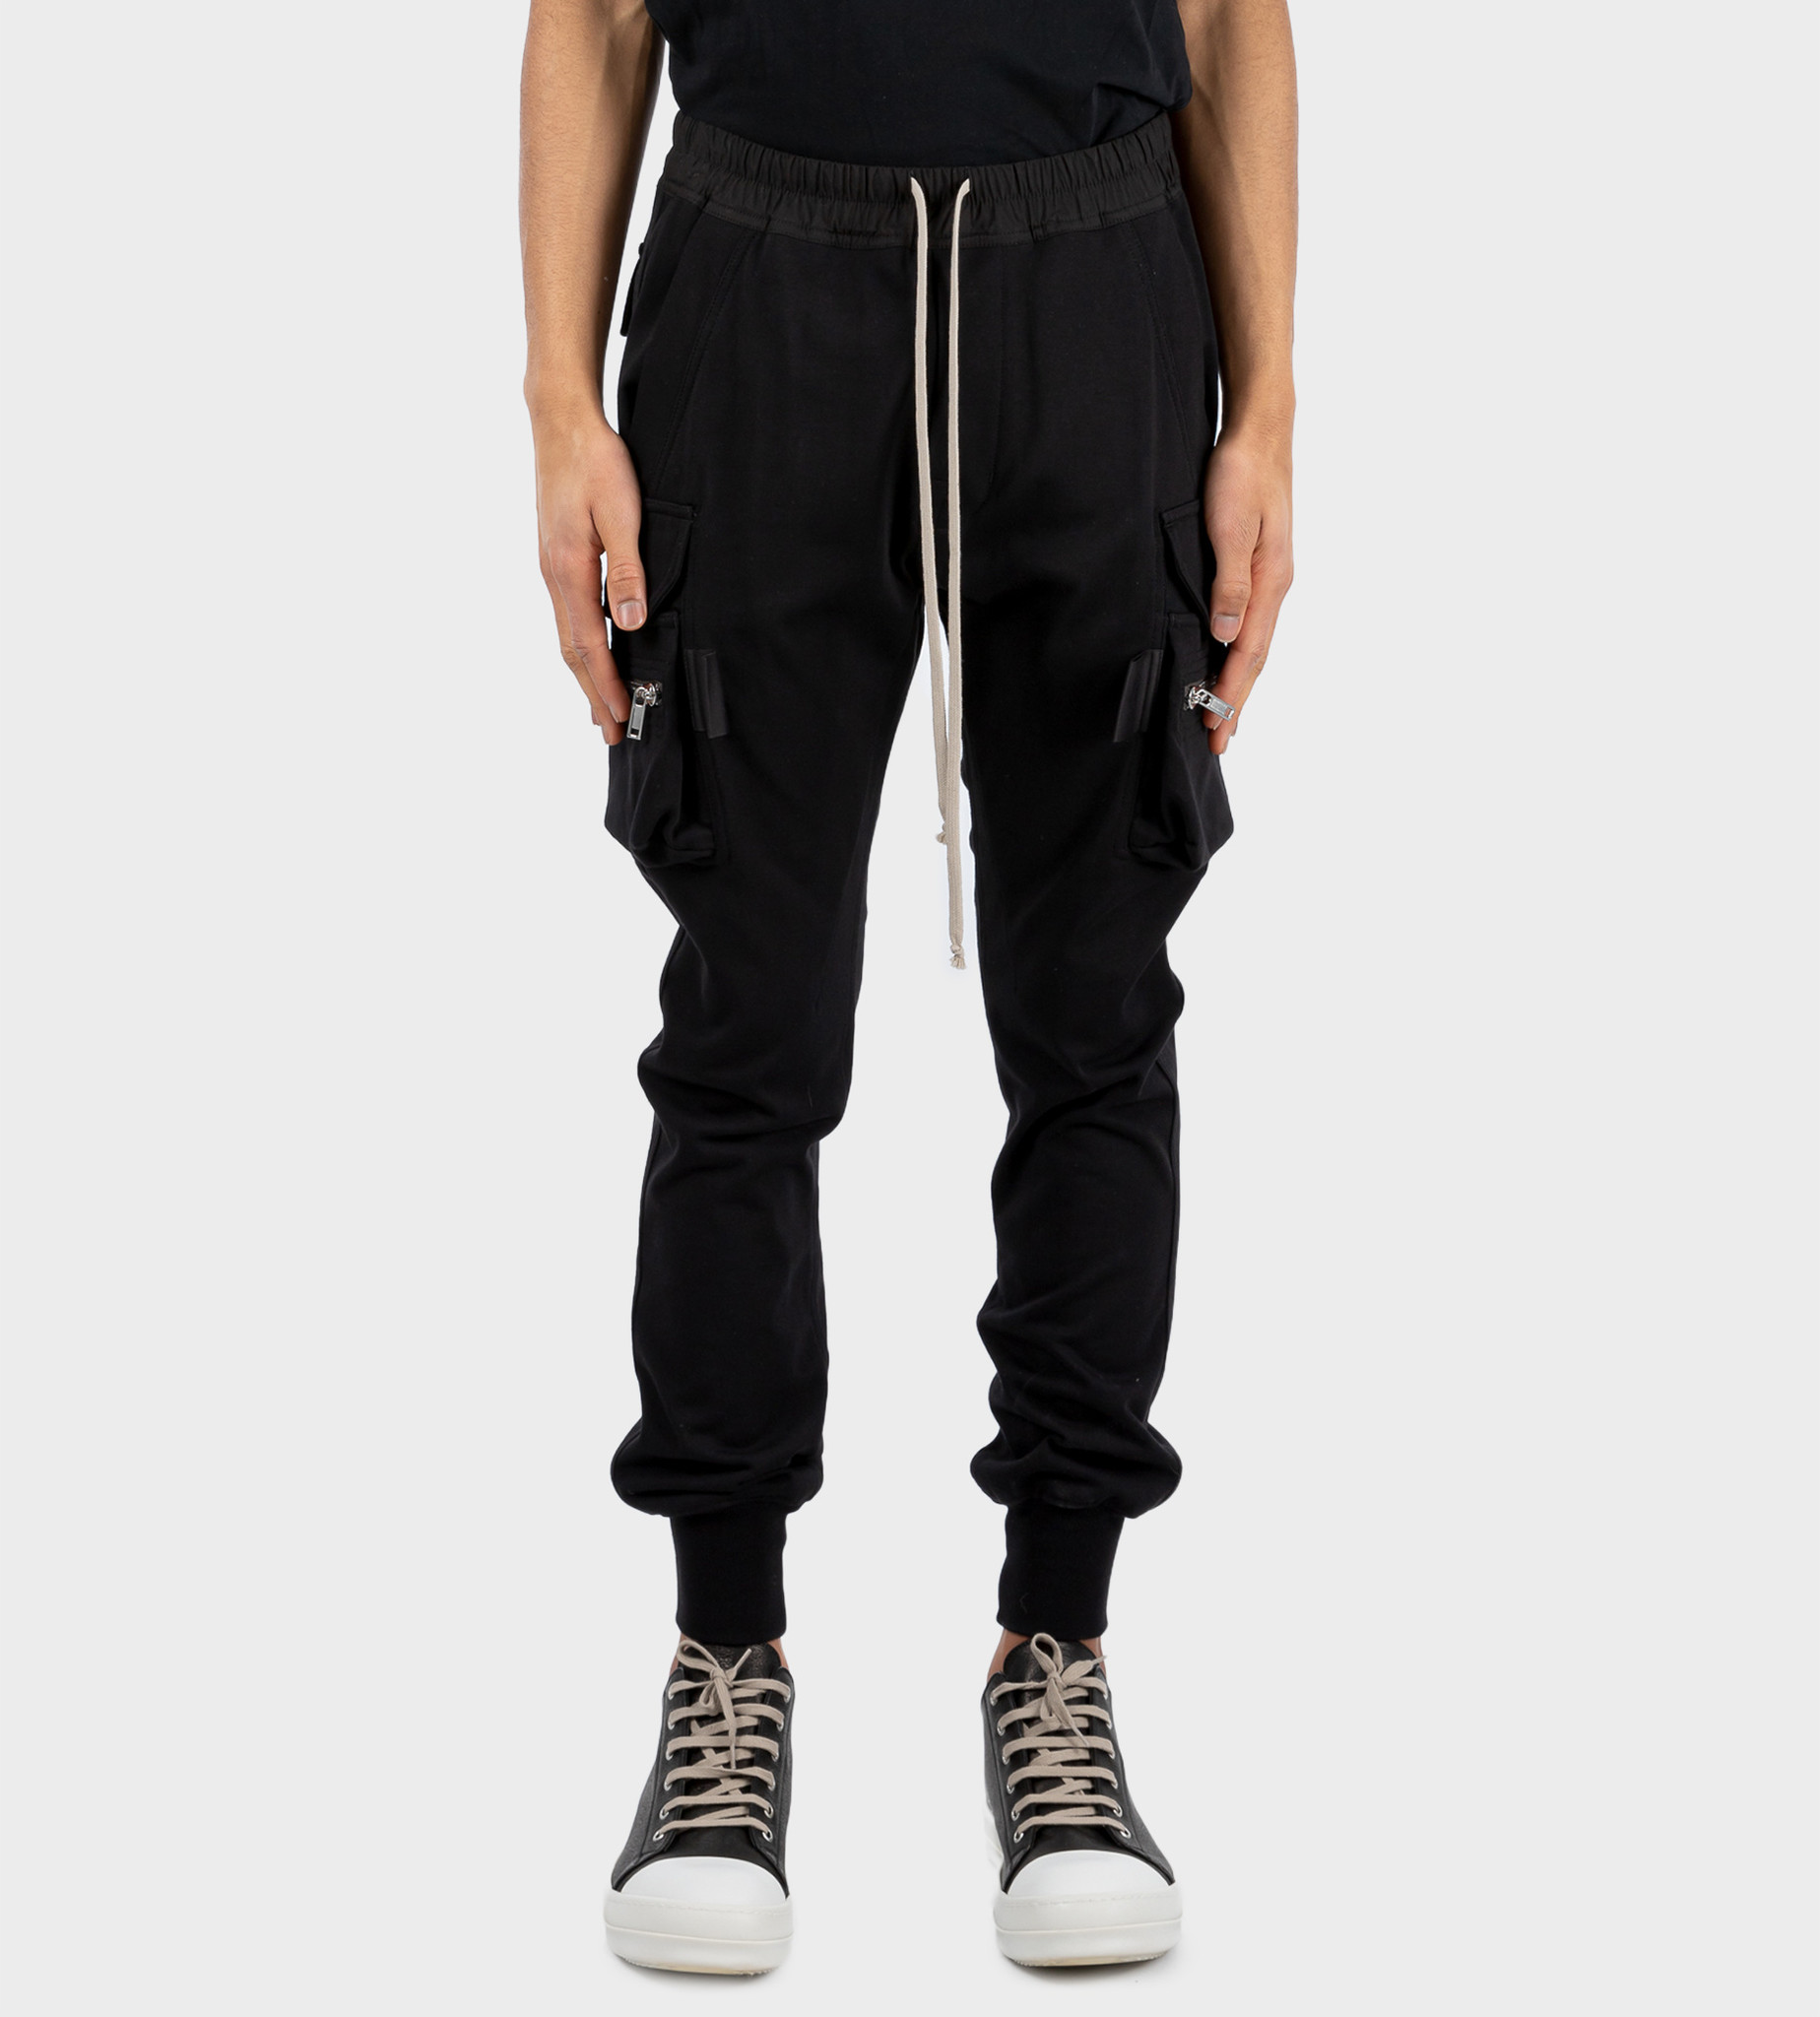 RICK OWENS Mastodon Cargo Pants Black